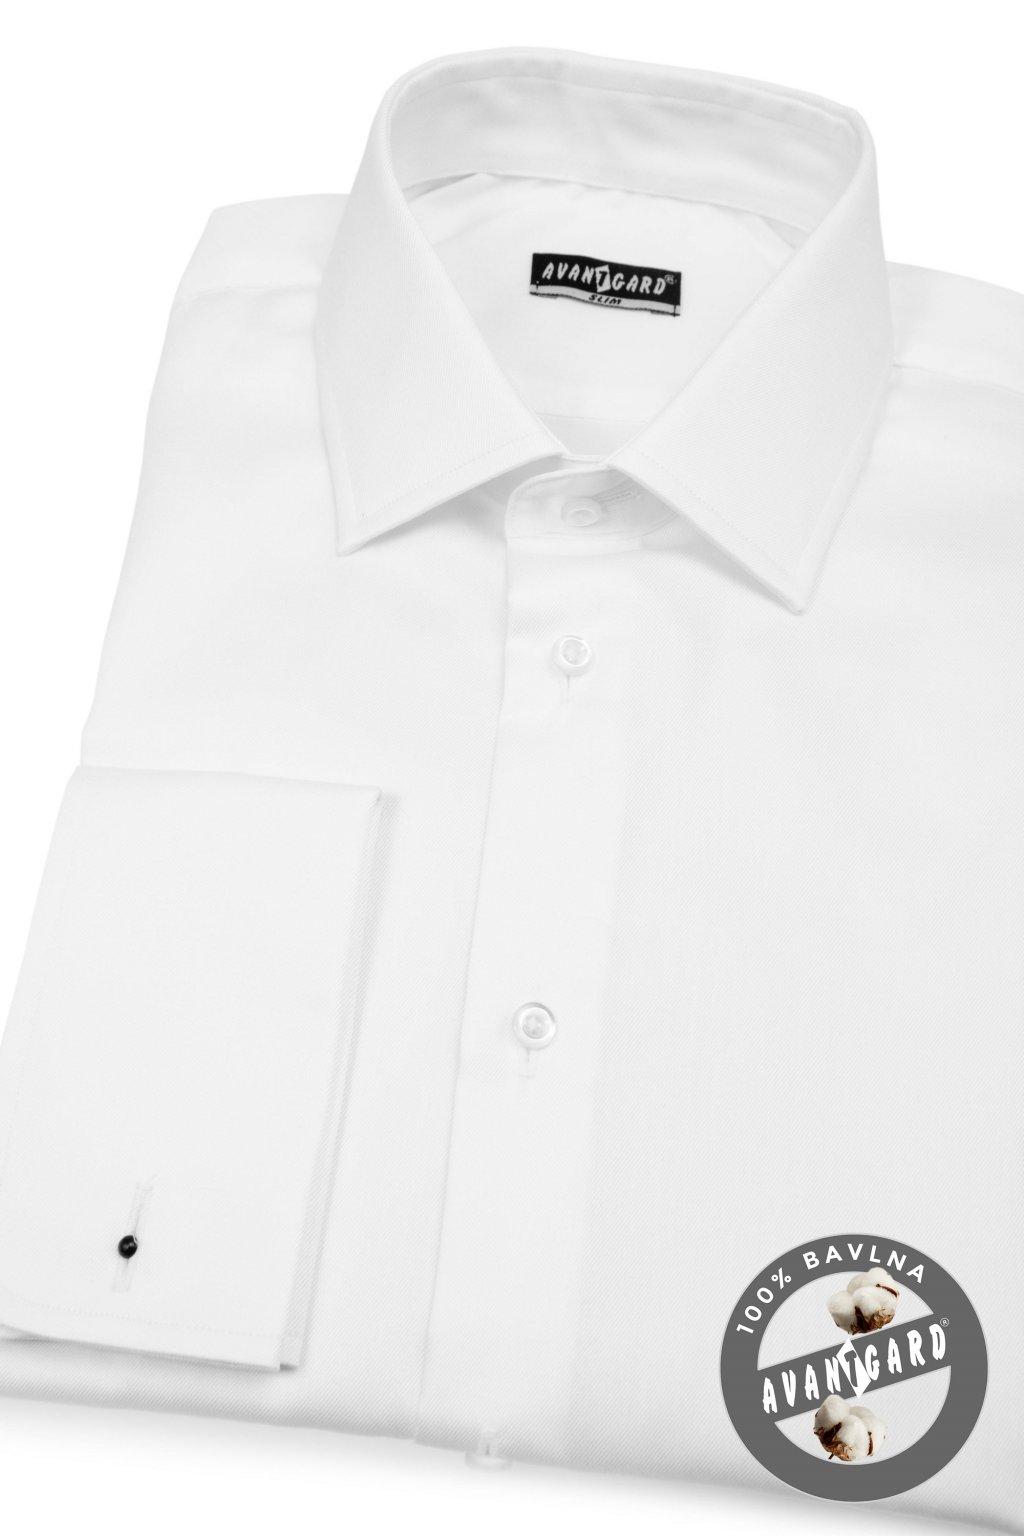 Pánská košile SLIM MK bílá 122 - 1